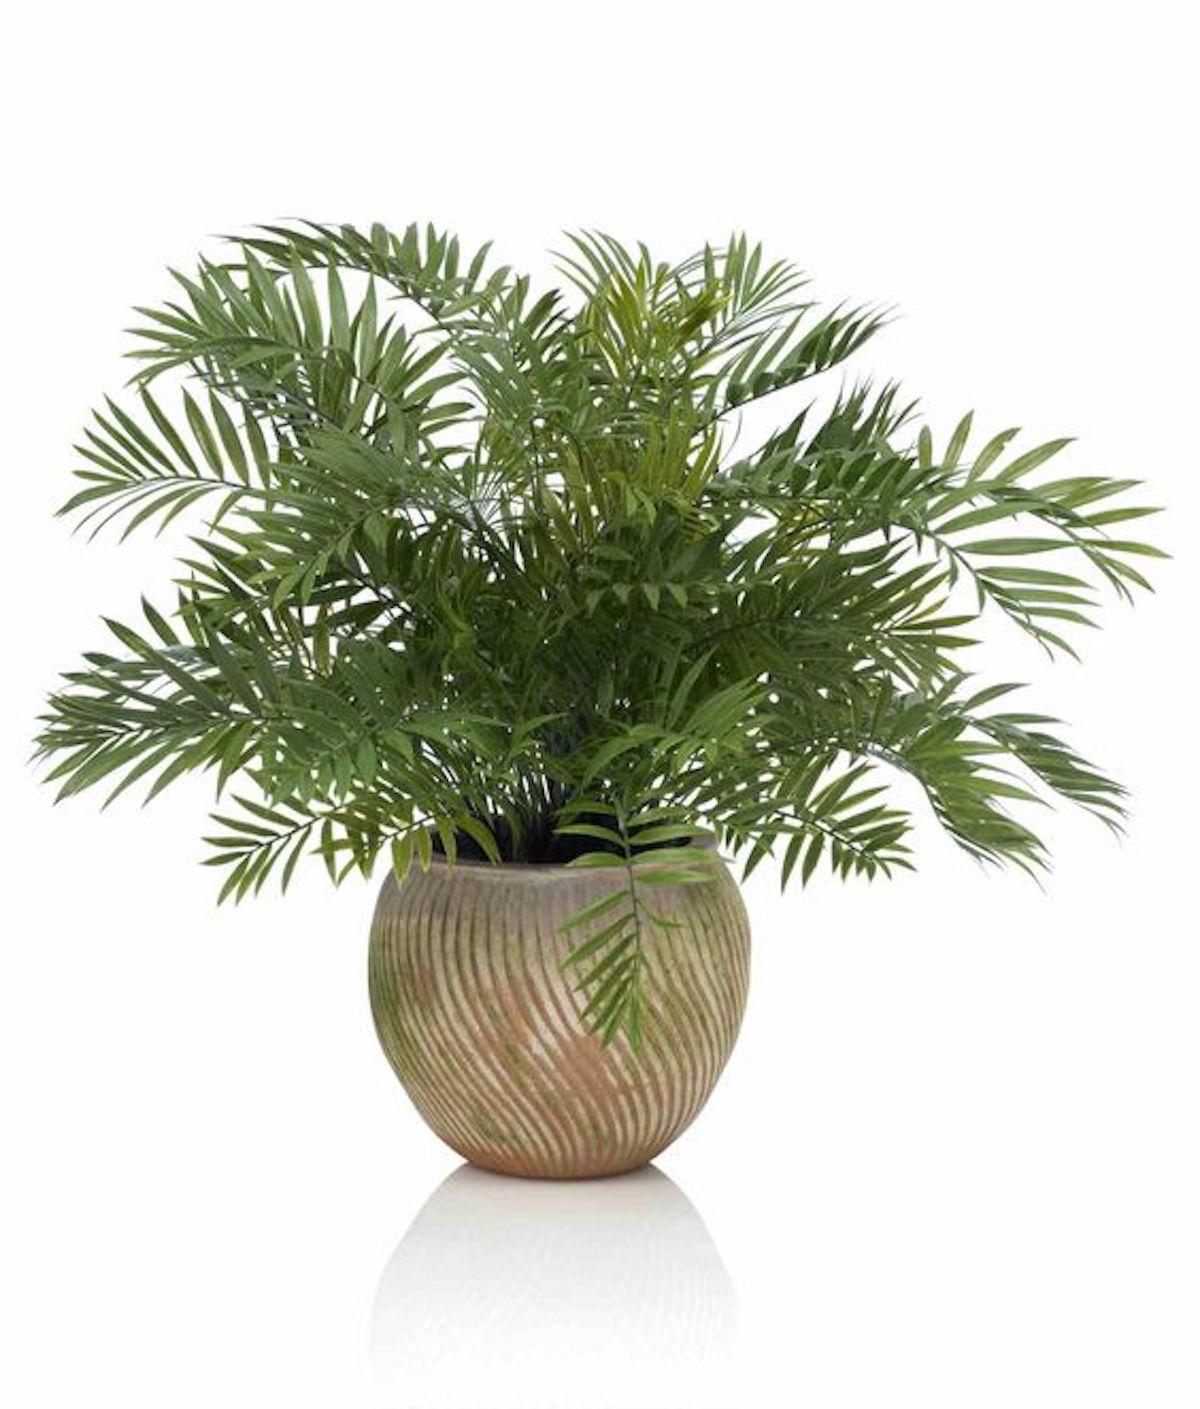 sobne rastline gardenia cvetlicarna beautyfull blog areca palm